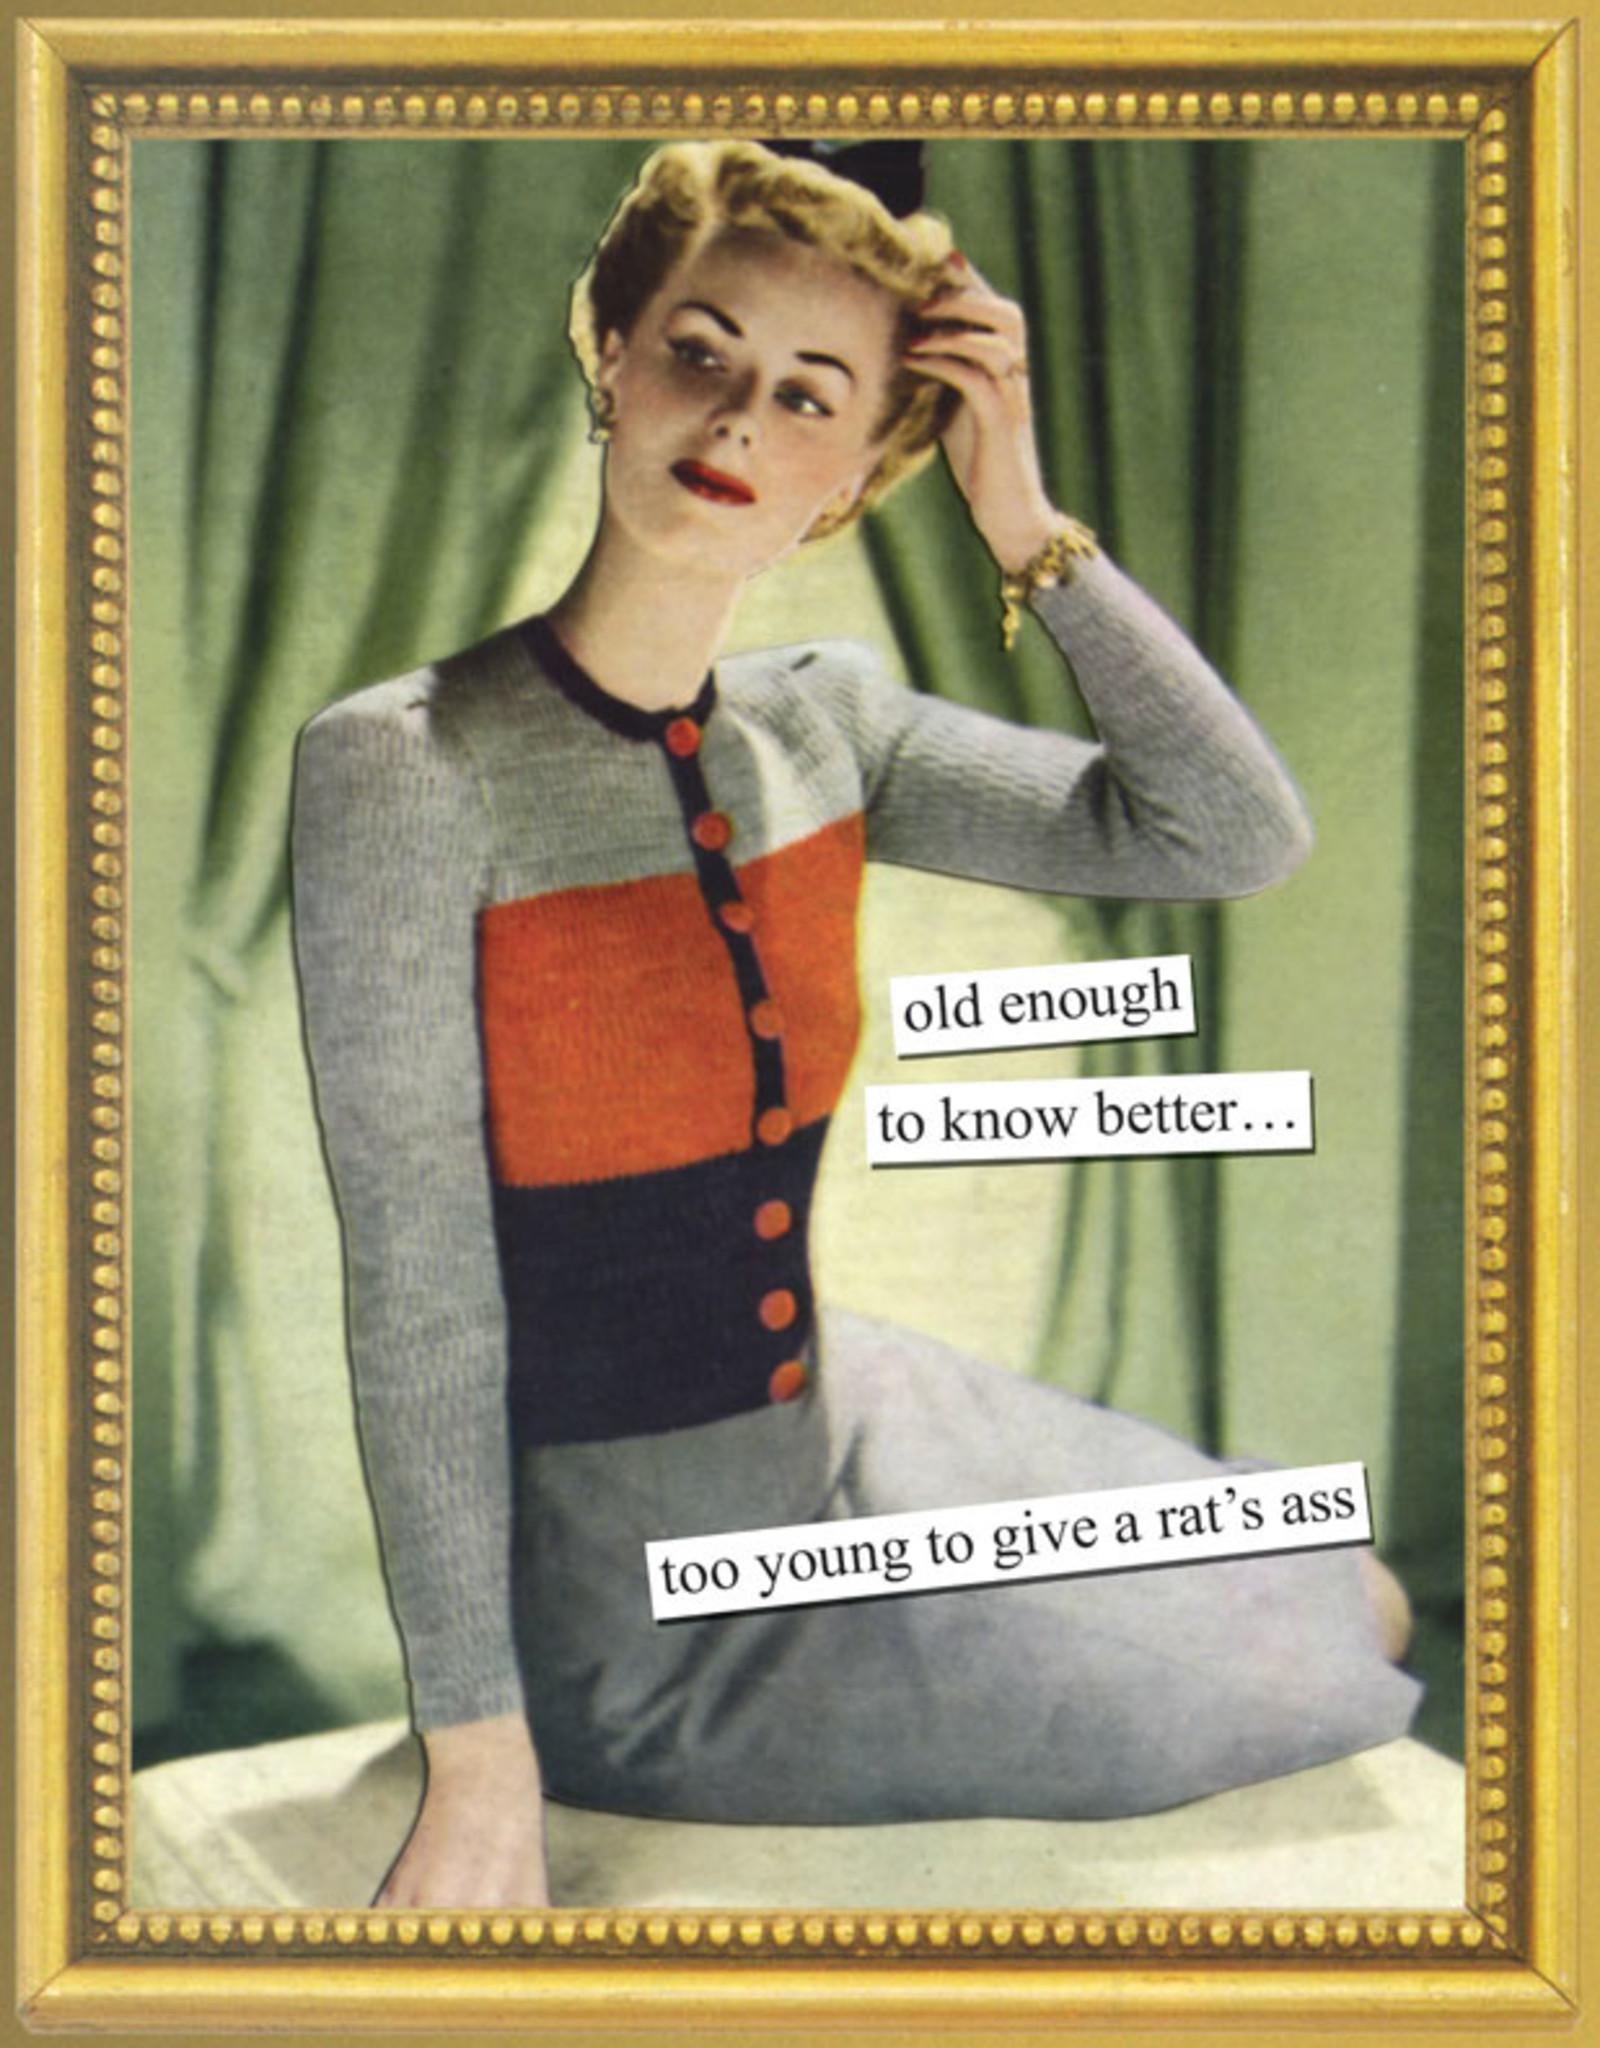 Anne Taintor Birthday Card - Rat's Ass